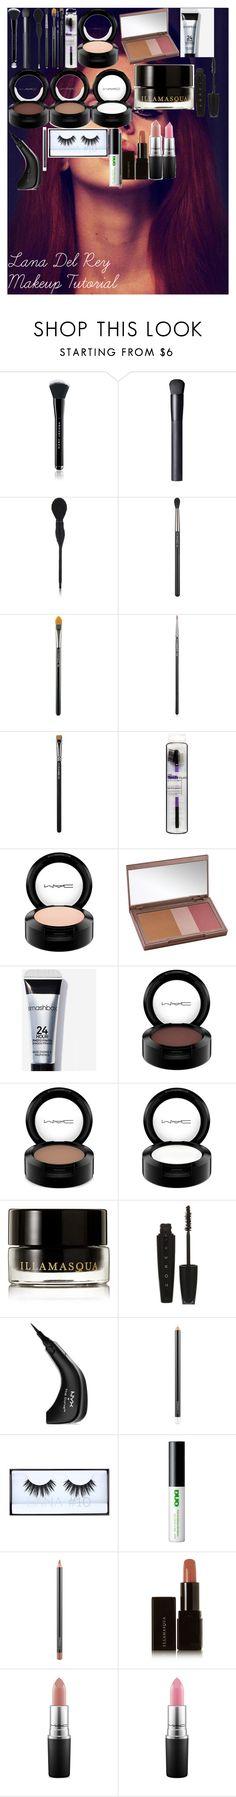 """Lana Del Rey Makeup Tutorial"" by oroartye-1 on Polyvore featuring beauty, Marc Jacobs, NARS Cosmetics, MAC Cosmetics, Urban Decay, Illamasqua, L'Oréal Paris, NYX, Huda Beauty and 210"